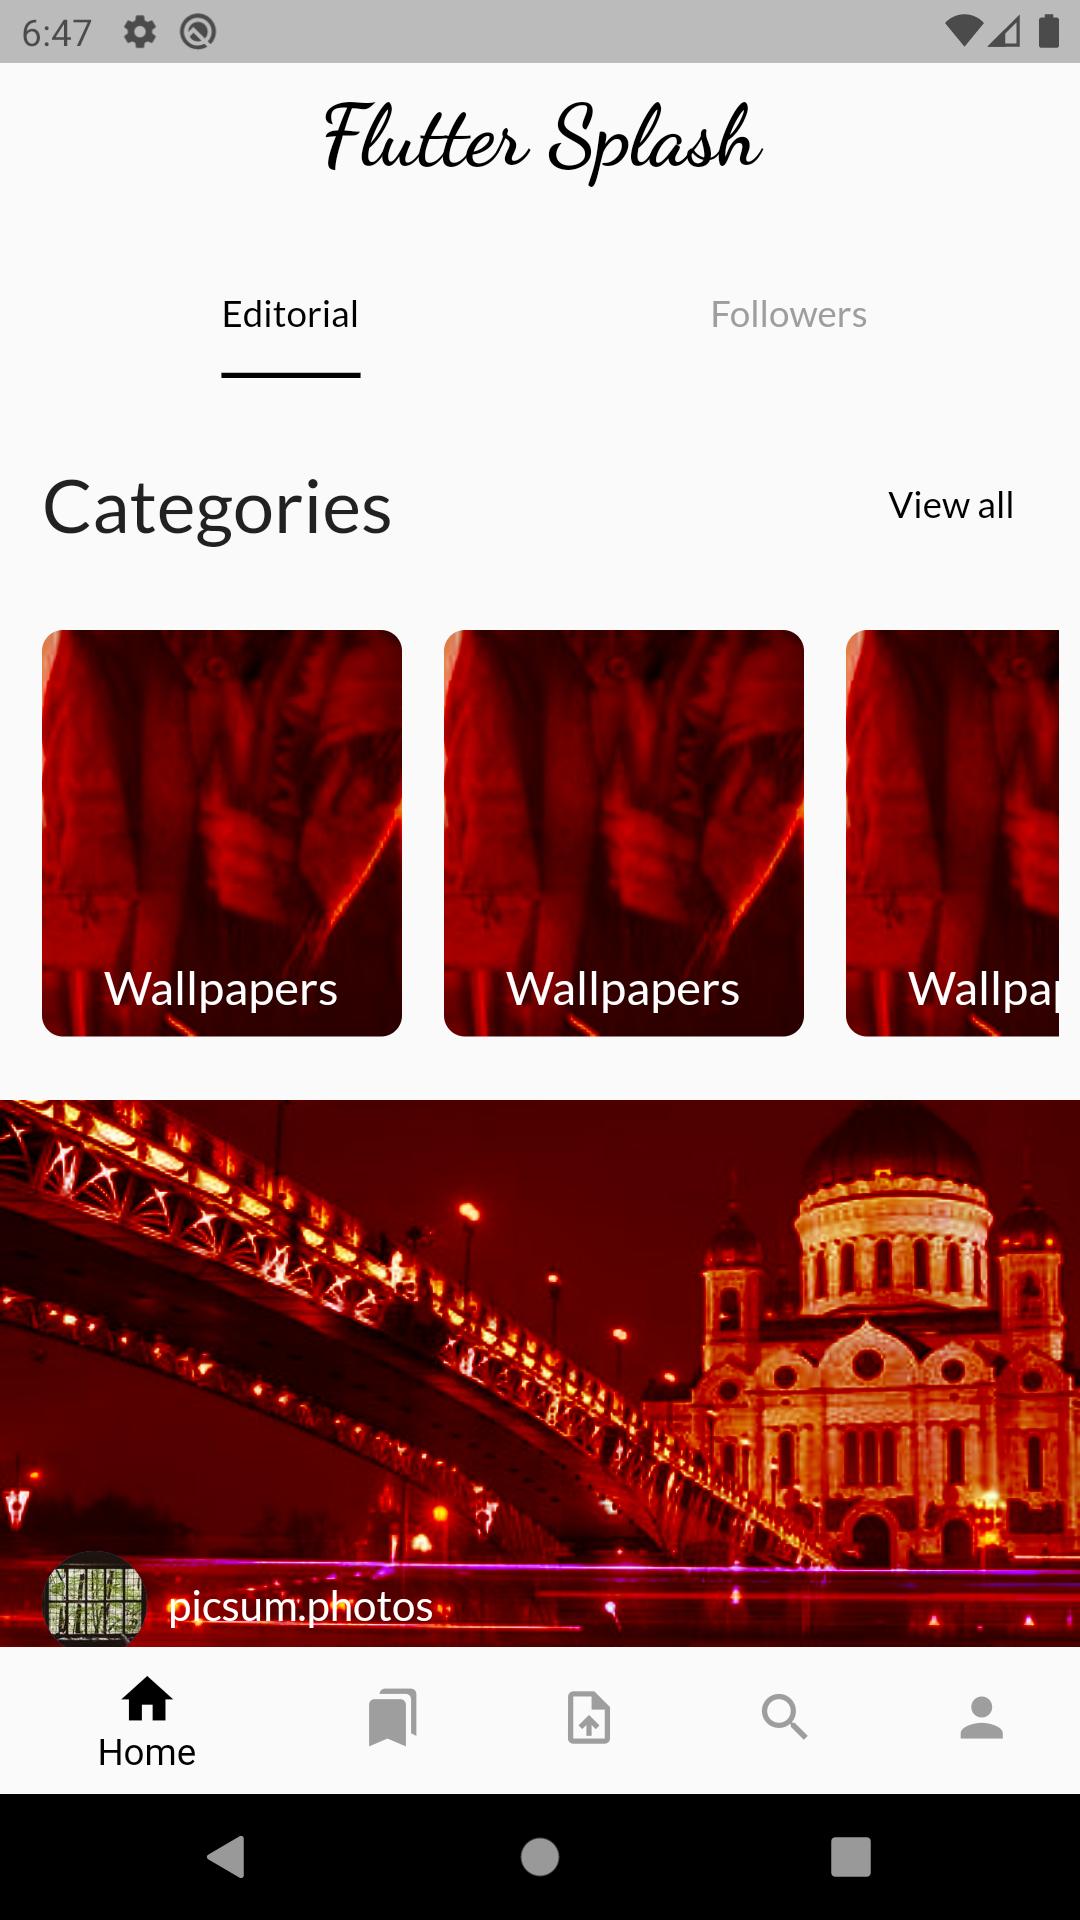 Redesign Unsplash Mobile Application with flutter tools